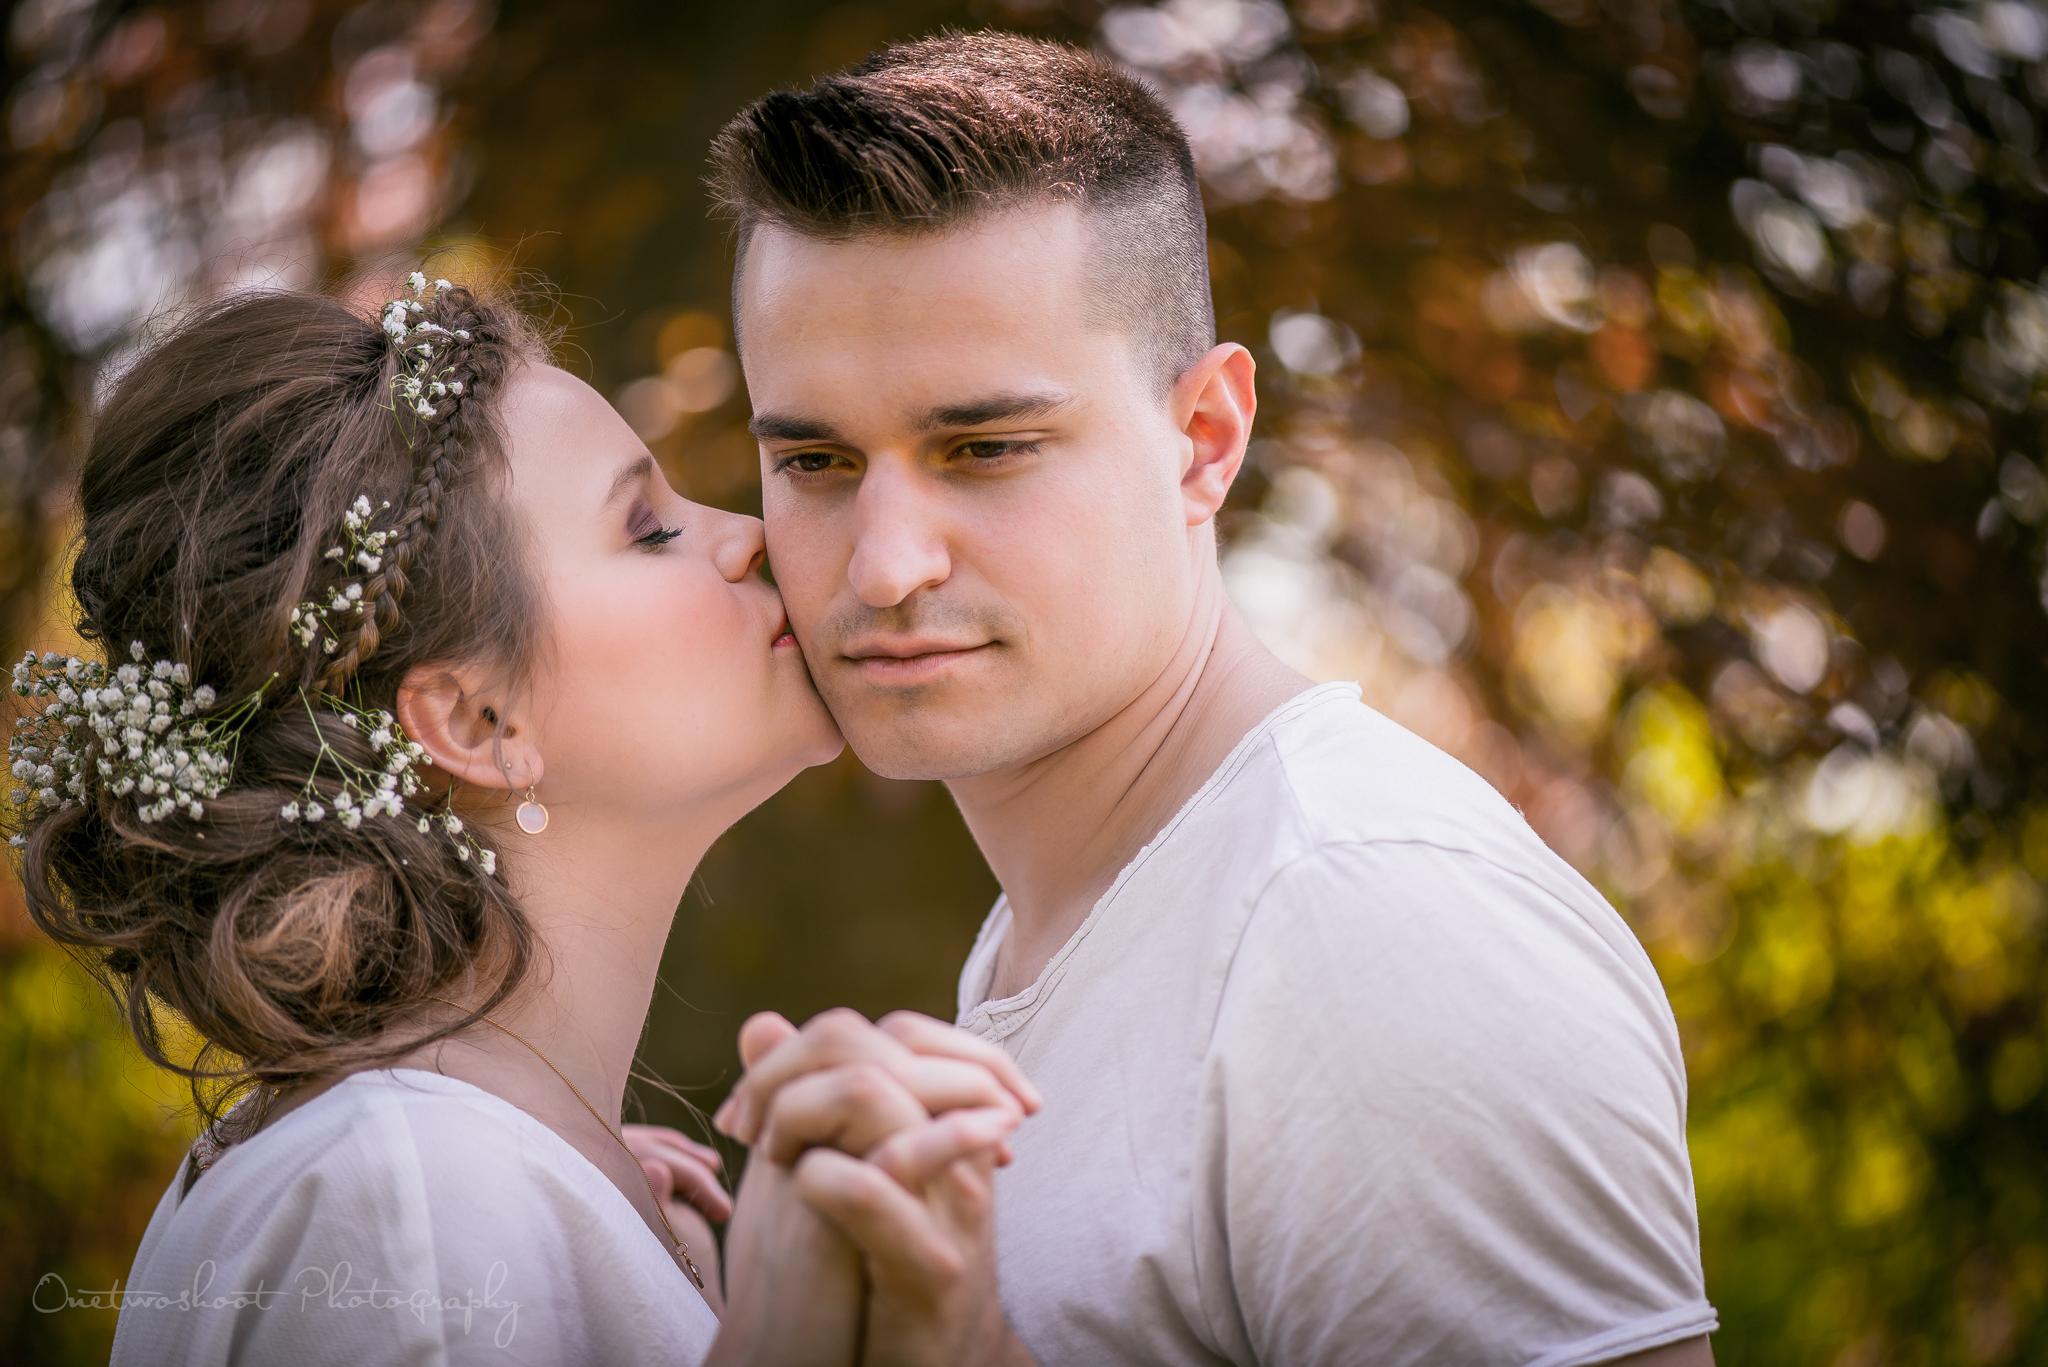 loveshoot Miek en Wesley in Park blauwendael Waasmunster door huwelijksfotograaf trouwfotograaf onetwoshoor huwelijksfotografie